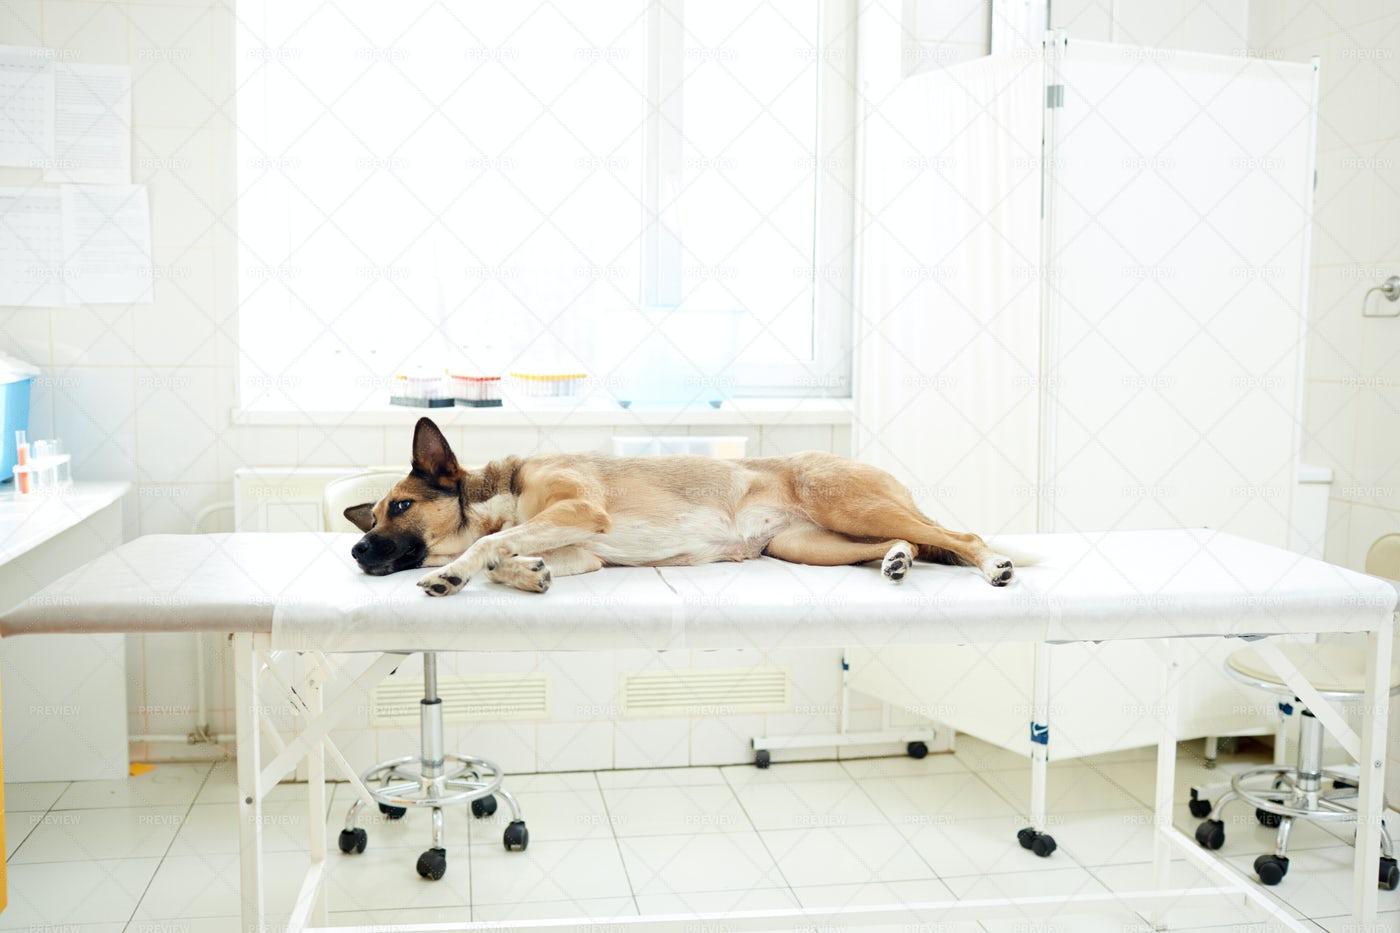 Sick Animal: Stock Photos